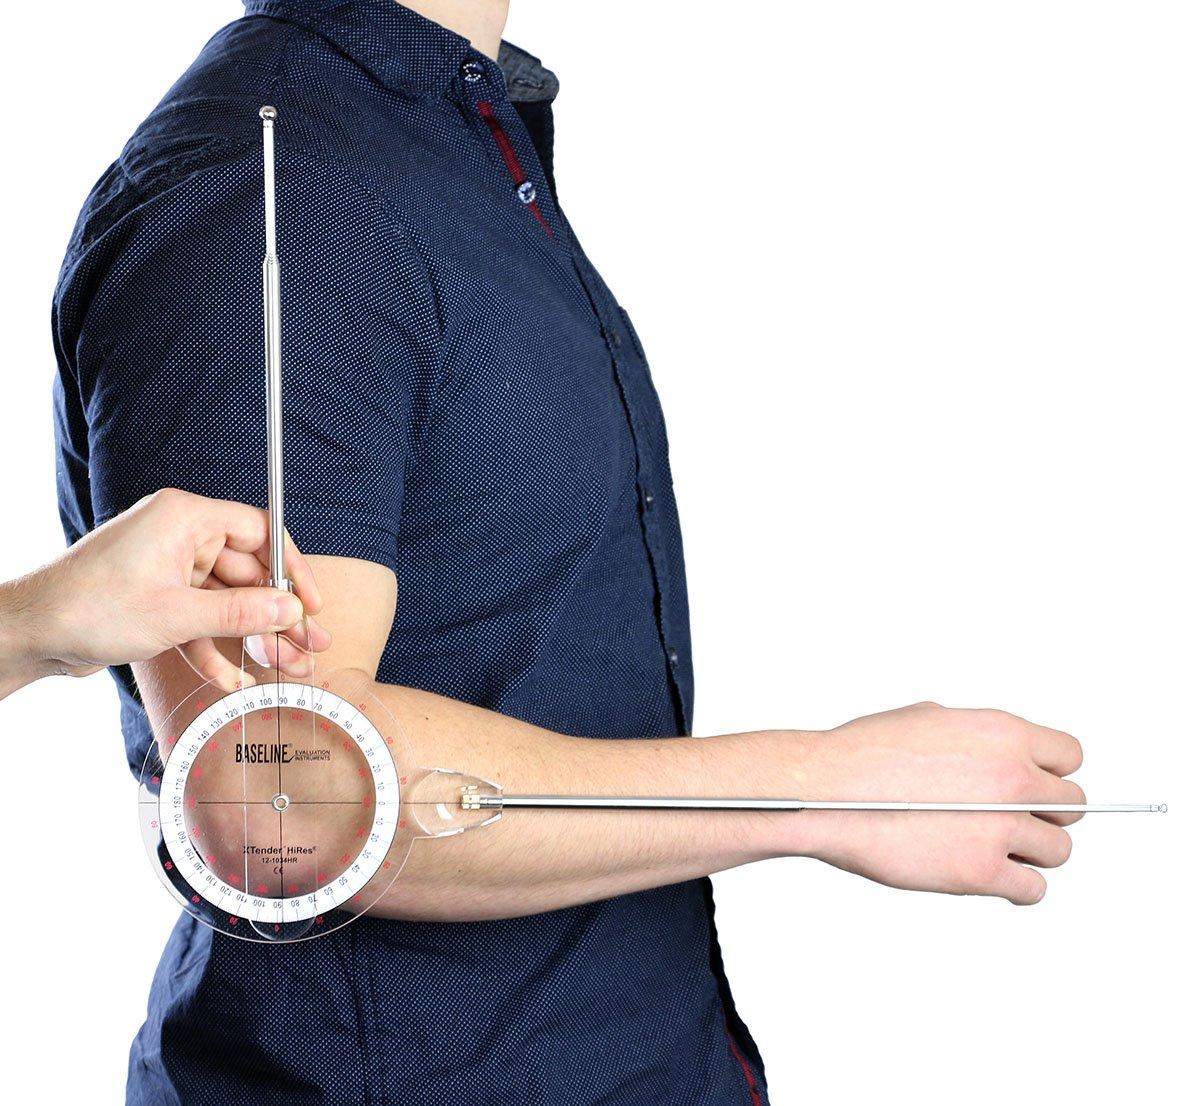 360 Degree Range Extendable Arms 9, 26 Baseline 12-1036 Extendable Goniometer